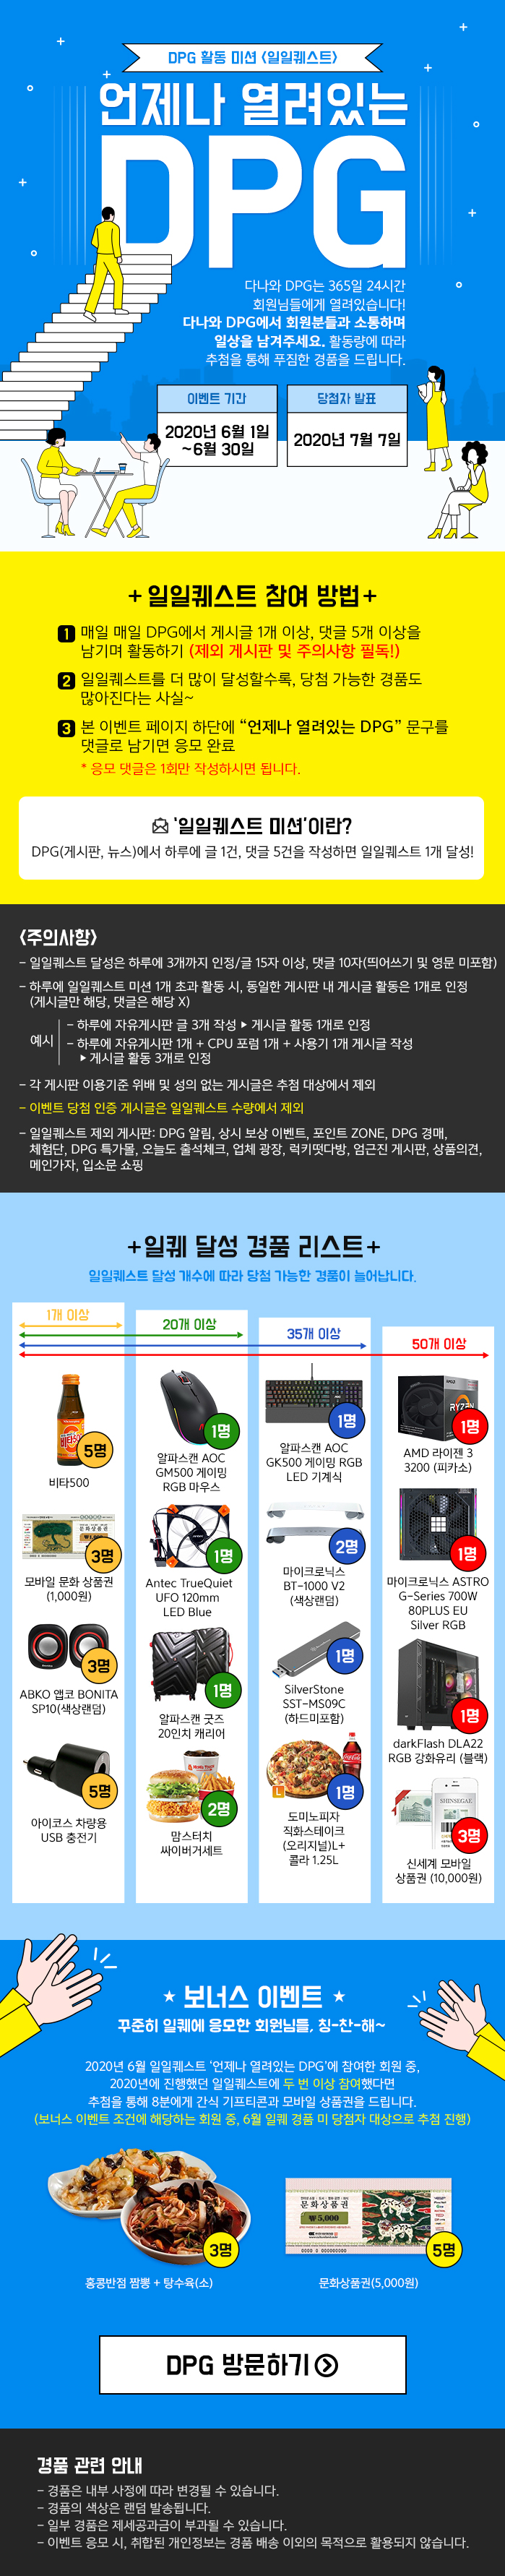 DPG 활동 미션 <일일퀘스트>언제나 열려있는 DPG